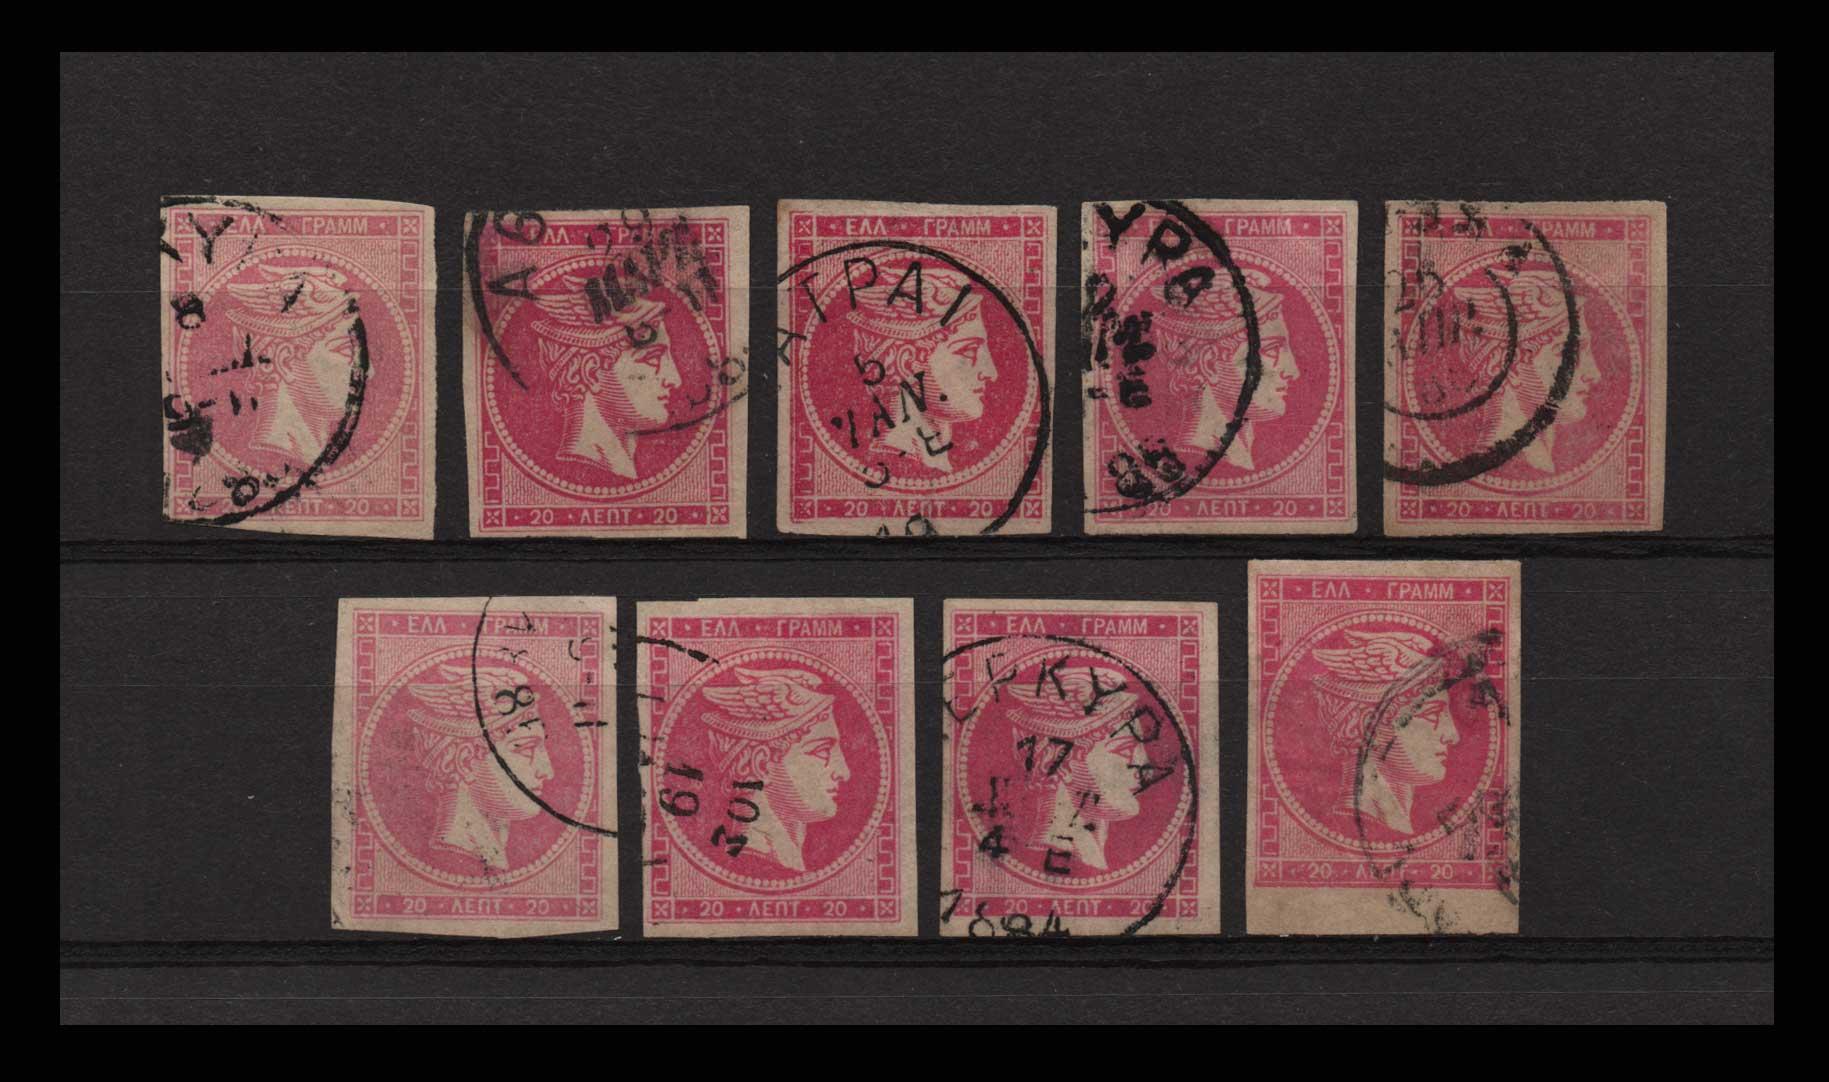 Lot 20 - -  LARGE HERMES HEAD large hermes head -  Athens Auctions Public Auction 71 General Stamp Sale